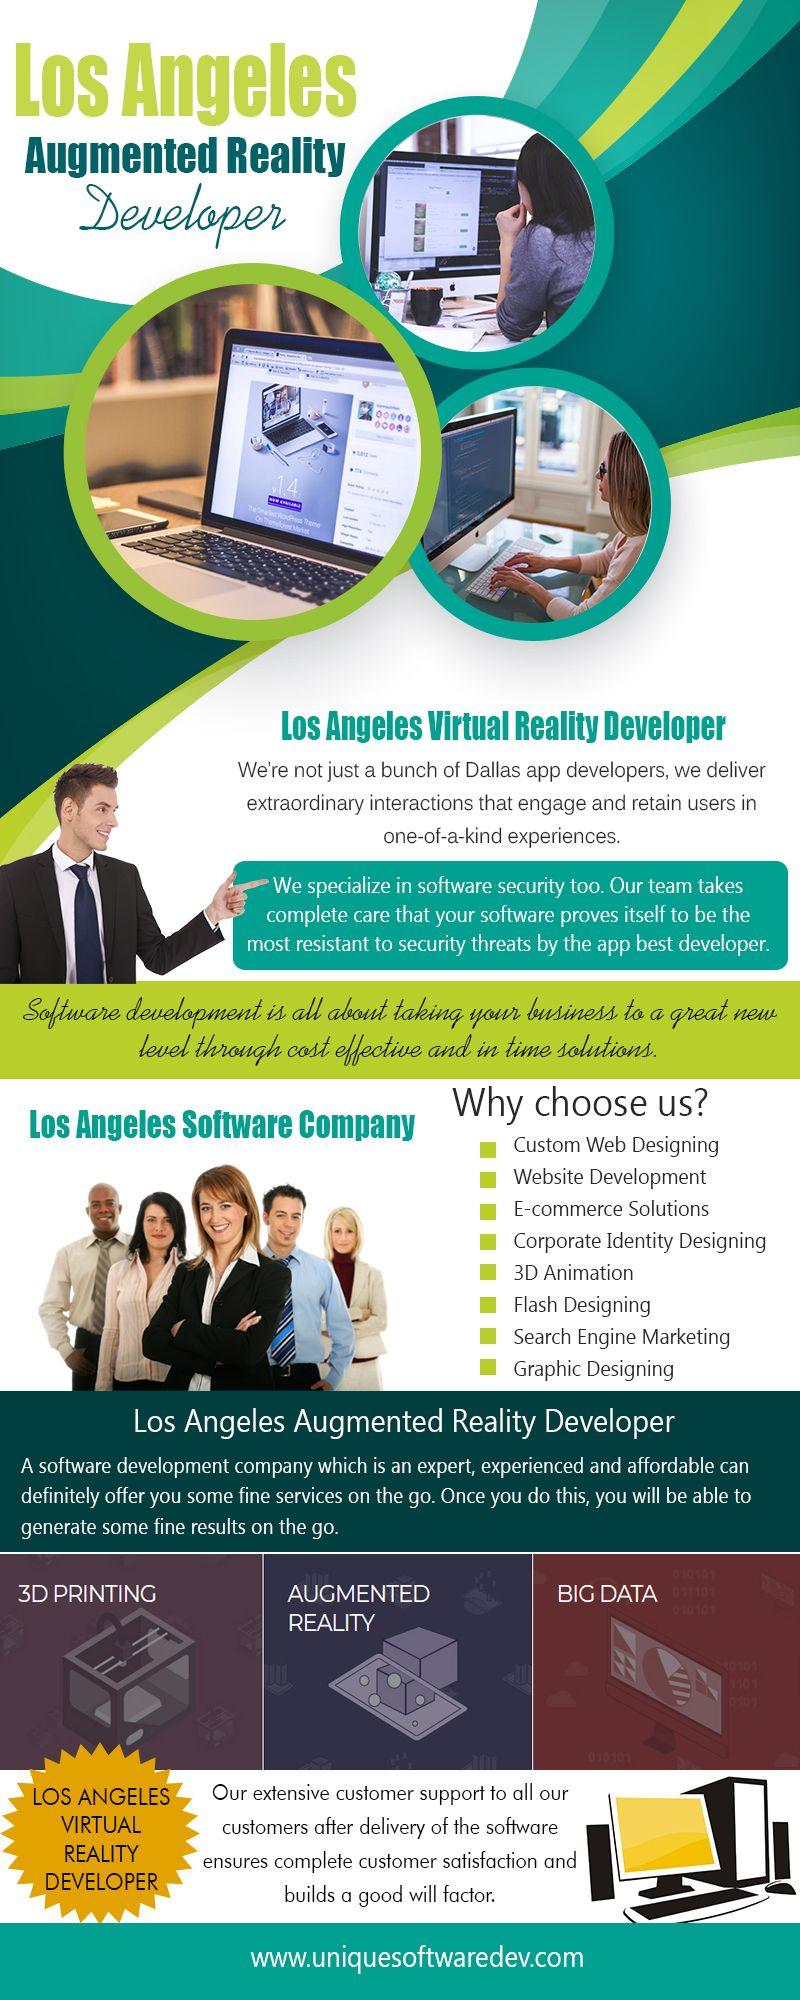 Los Angeles App Company | Best App Companies Near Me | App